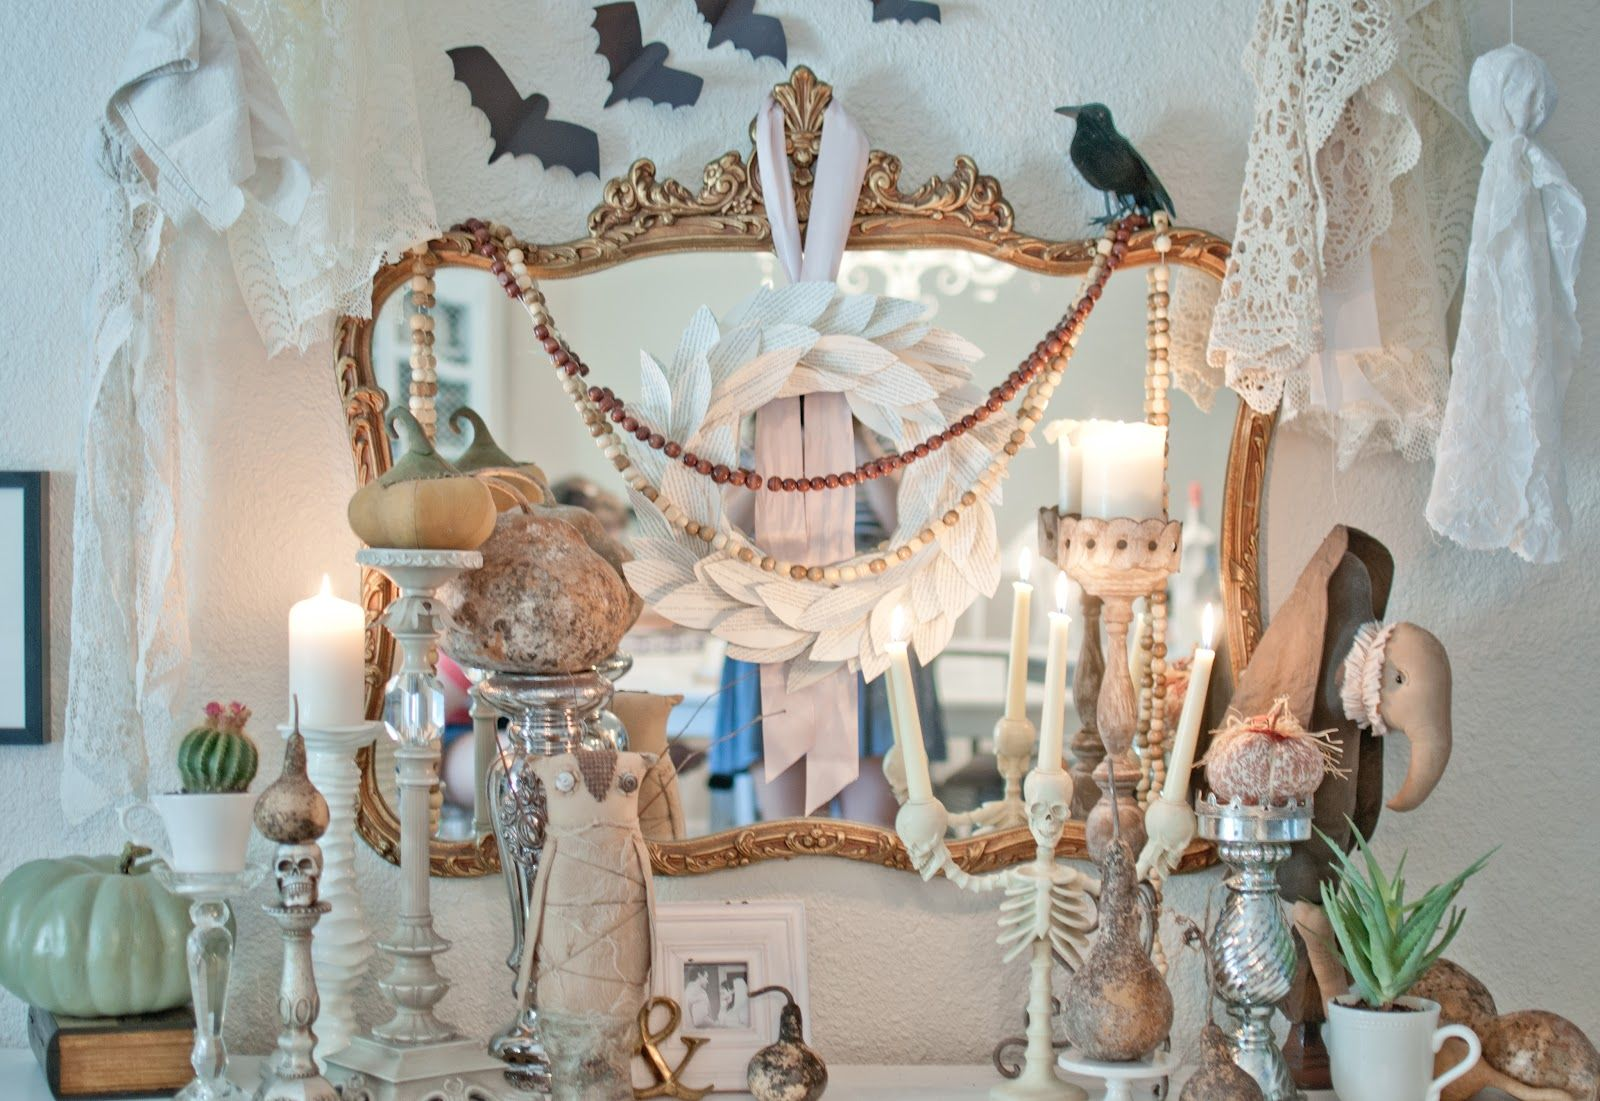 Spooky+Halloween+Decorations-1jpg 1,600×1,101 pixels Rustic - scary halloween decor